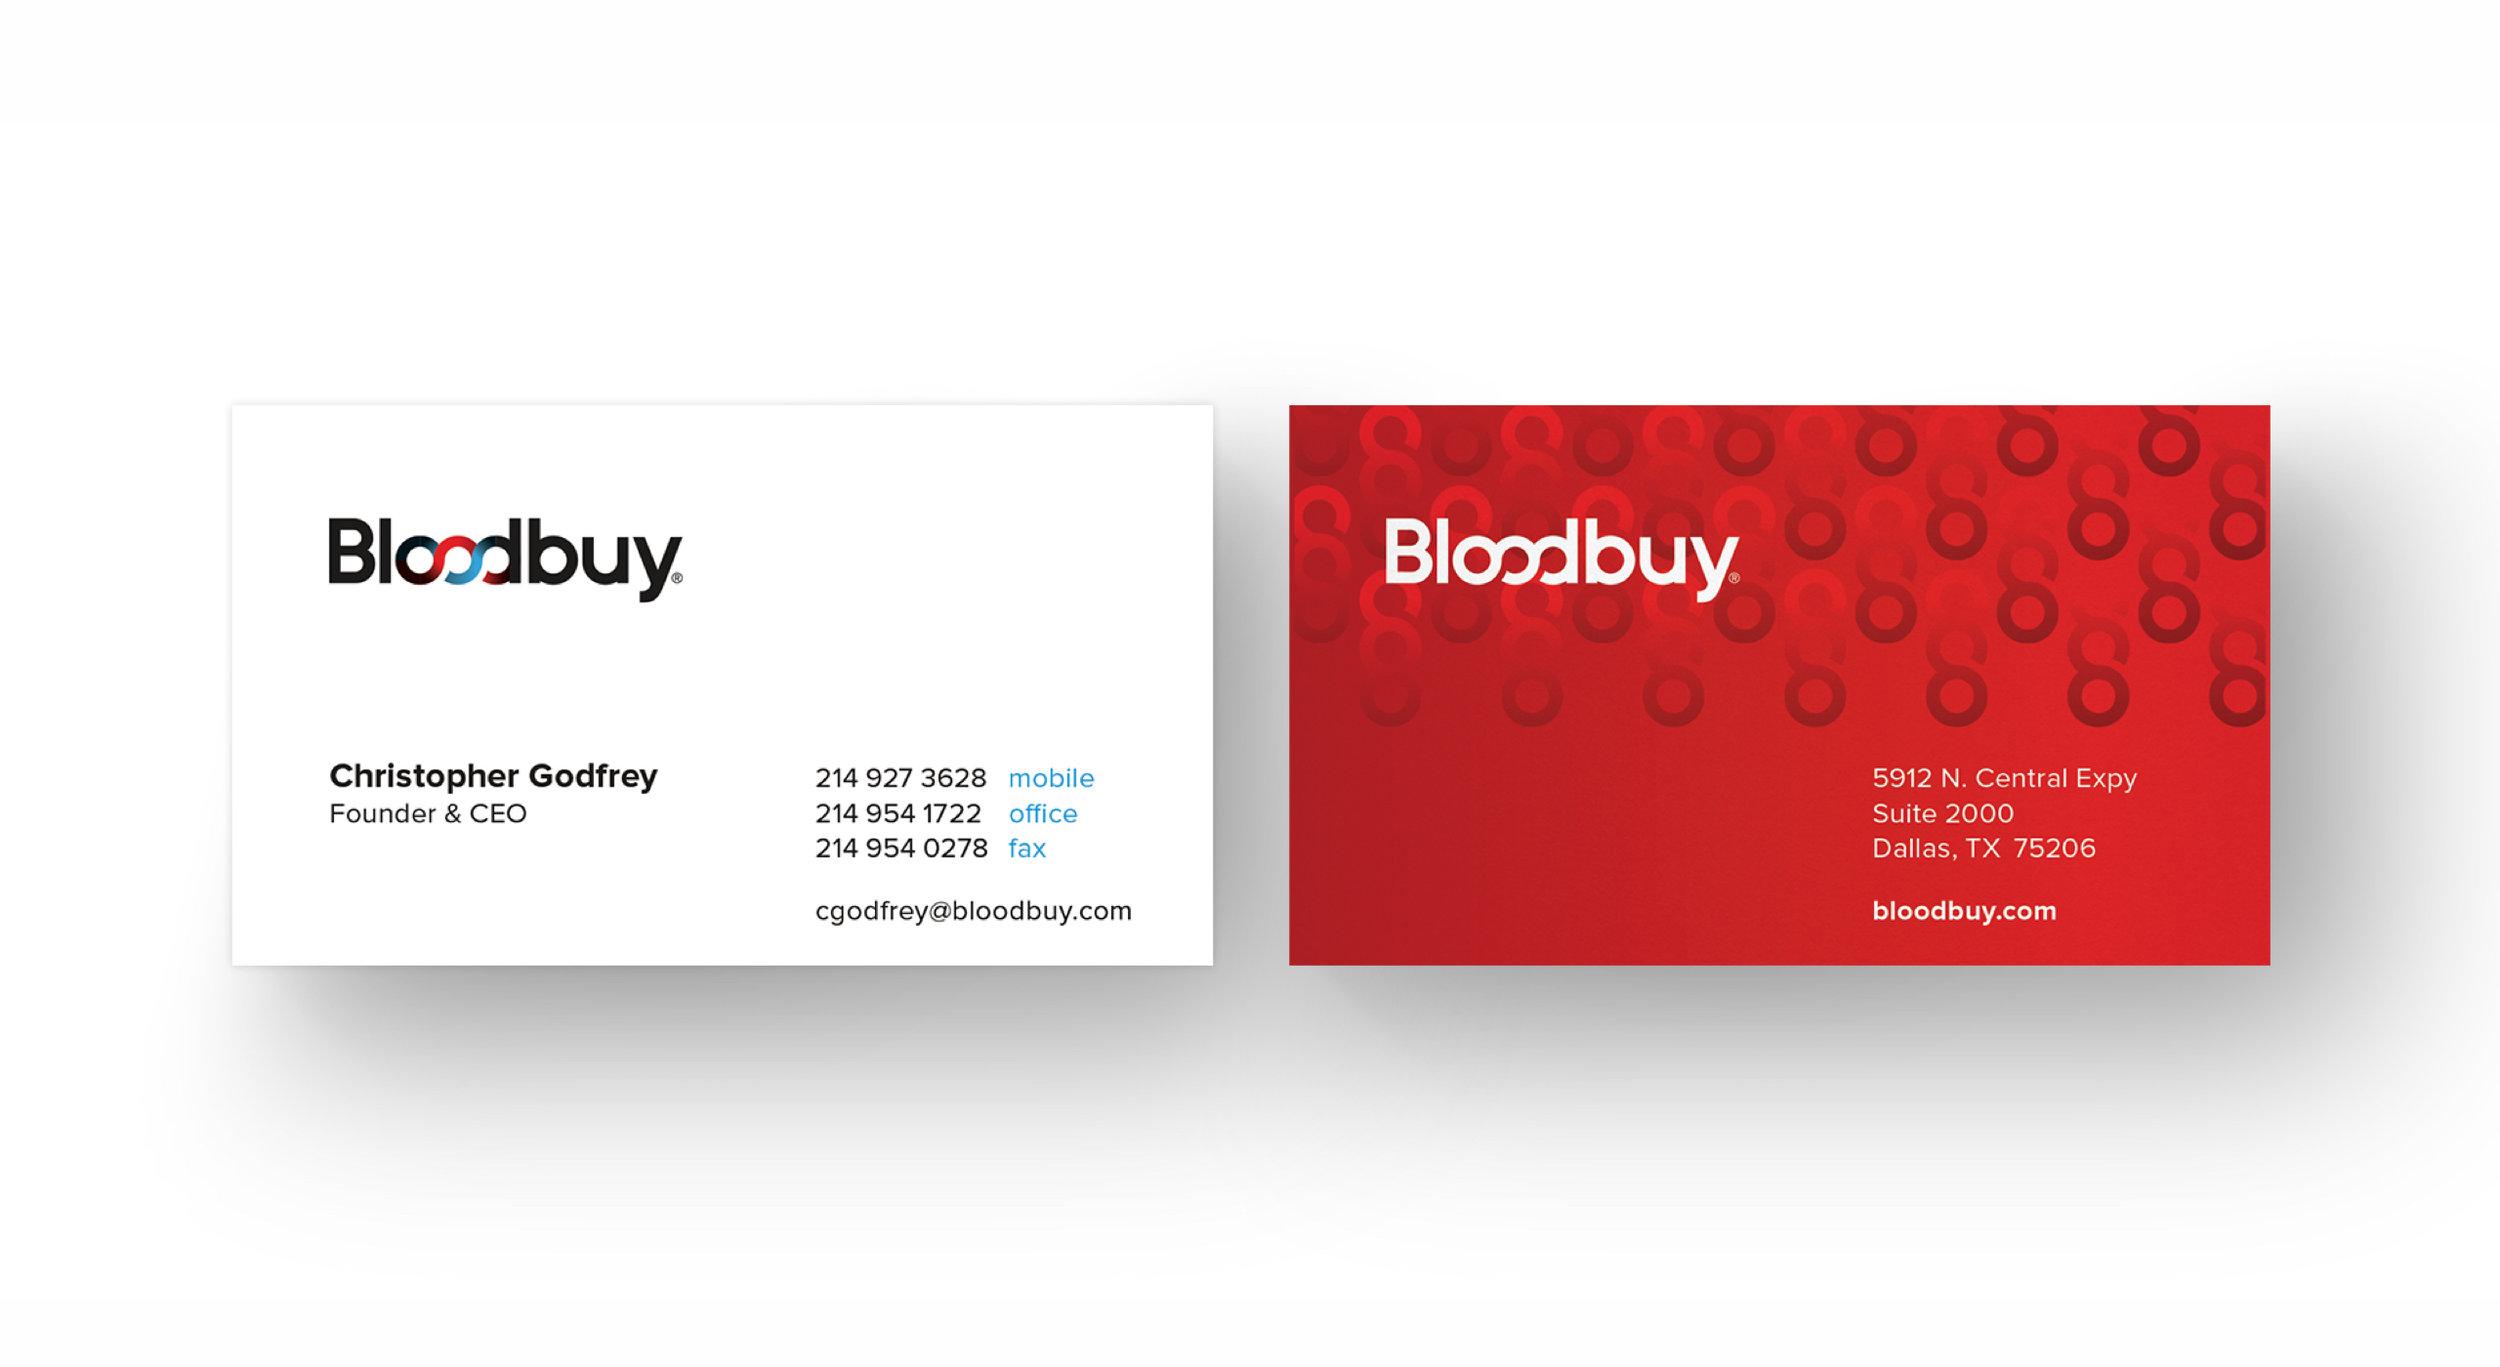 bloodbuy_brand-05@2x.jpg